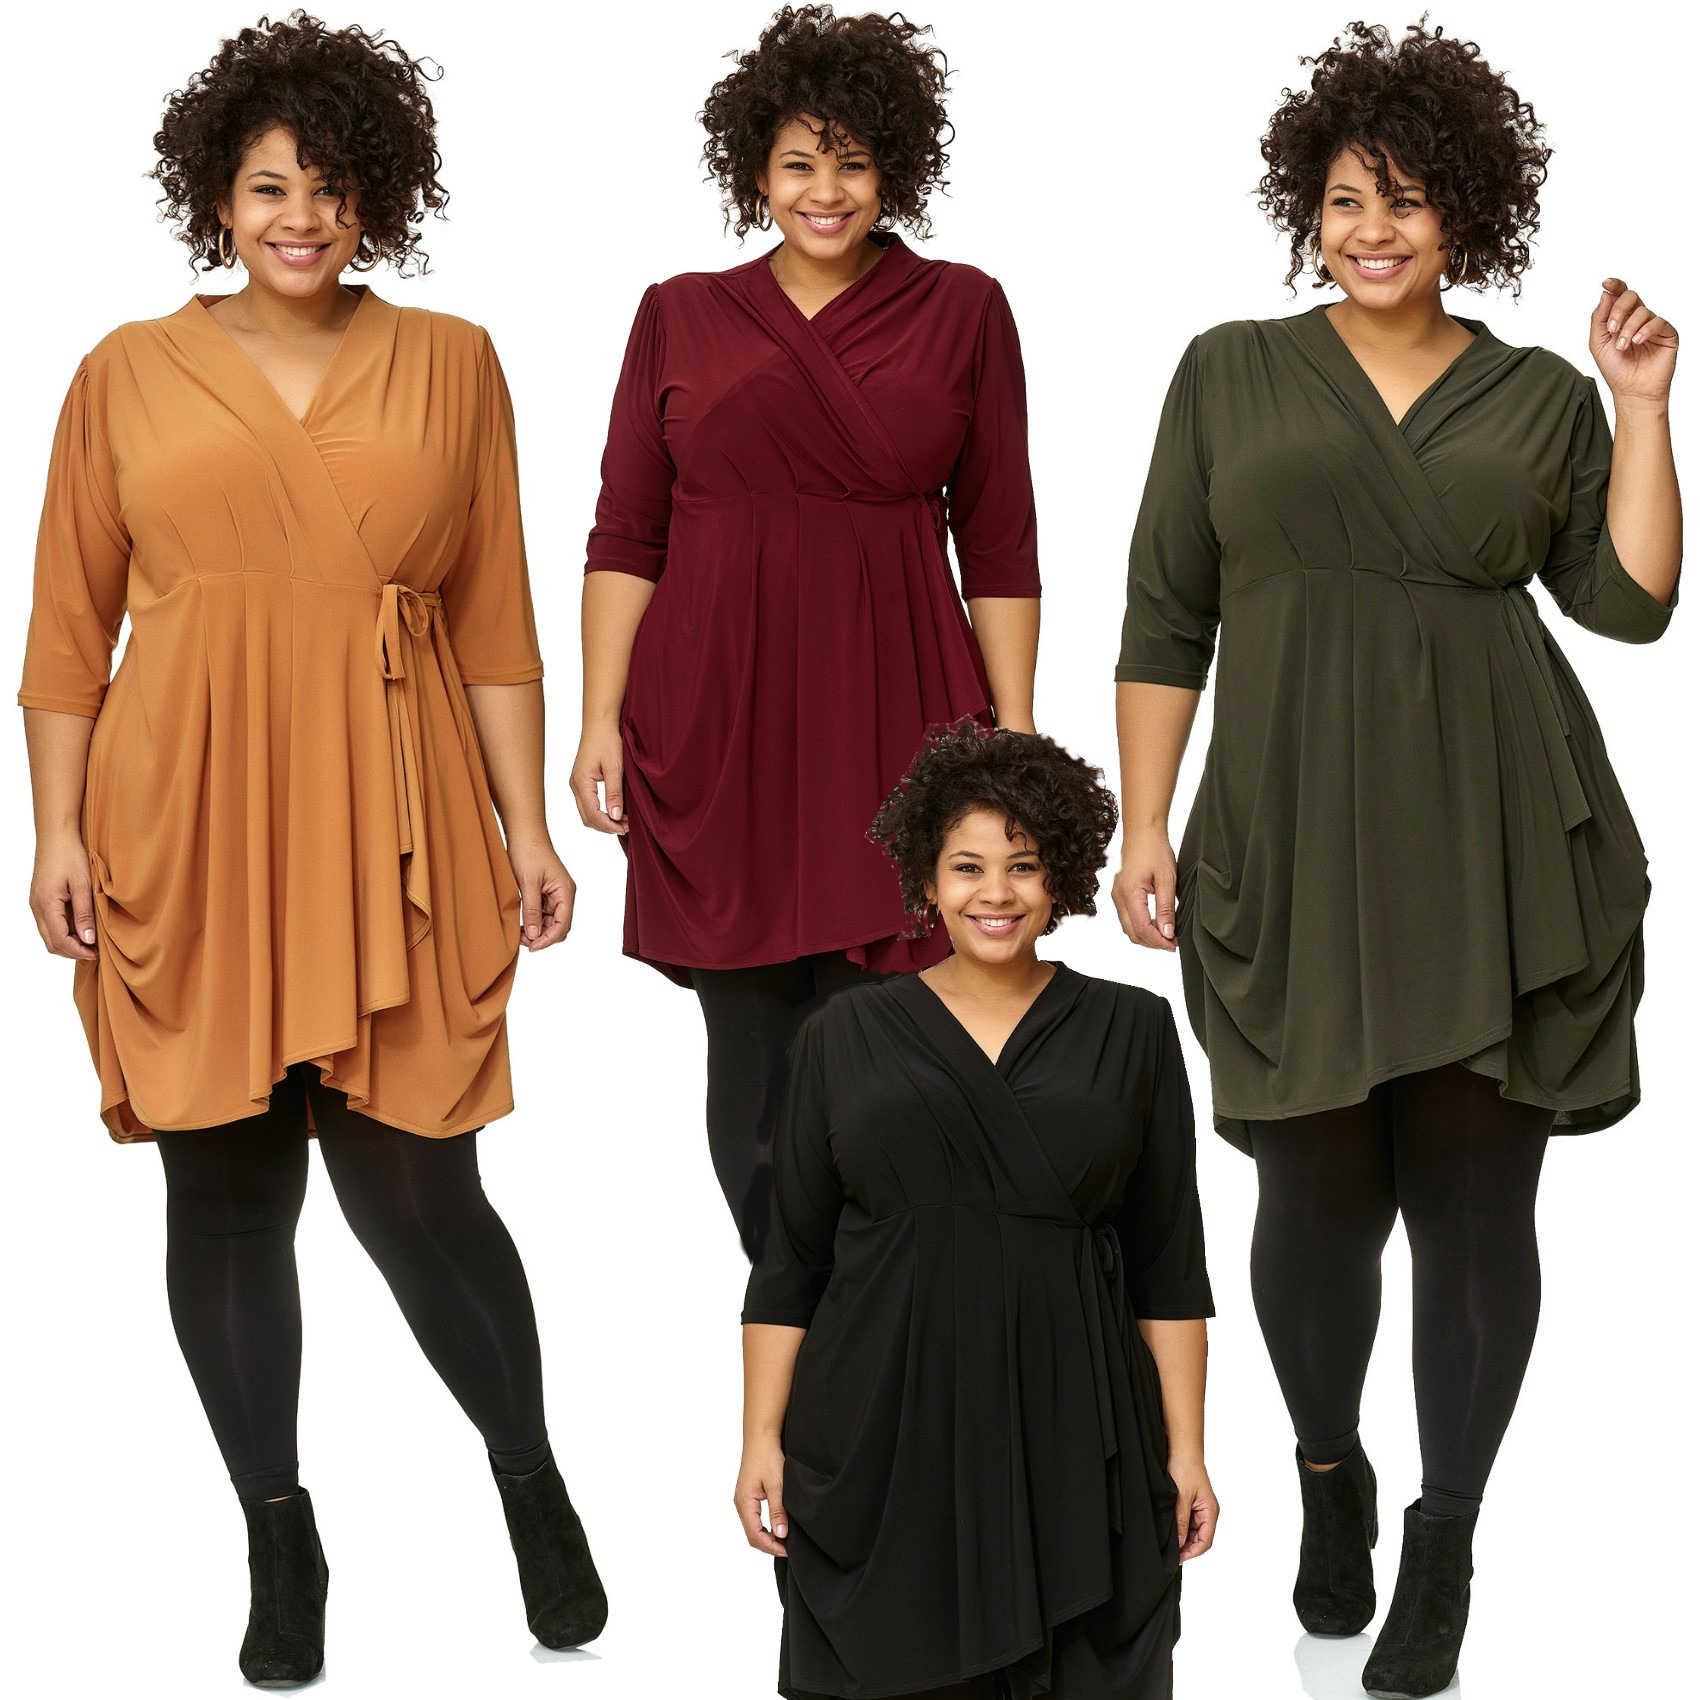 10 Kreativ Lange Kleider Größe 50 Ärmel Cool Lange Kleider Größe 50 Ärmel